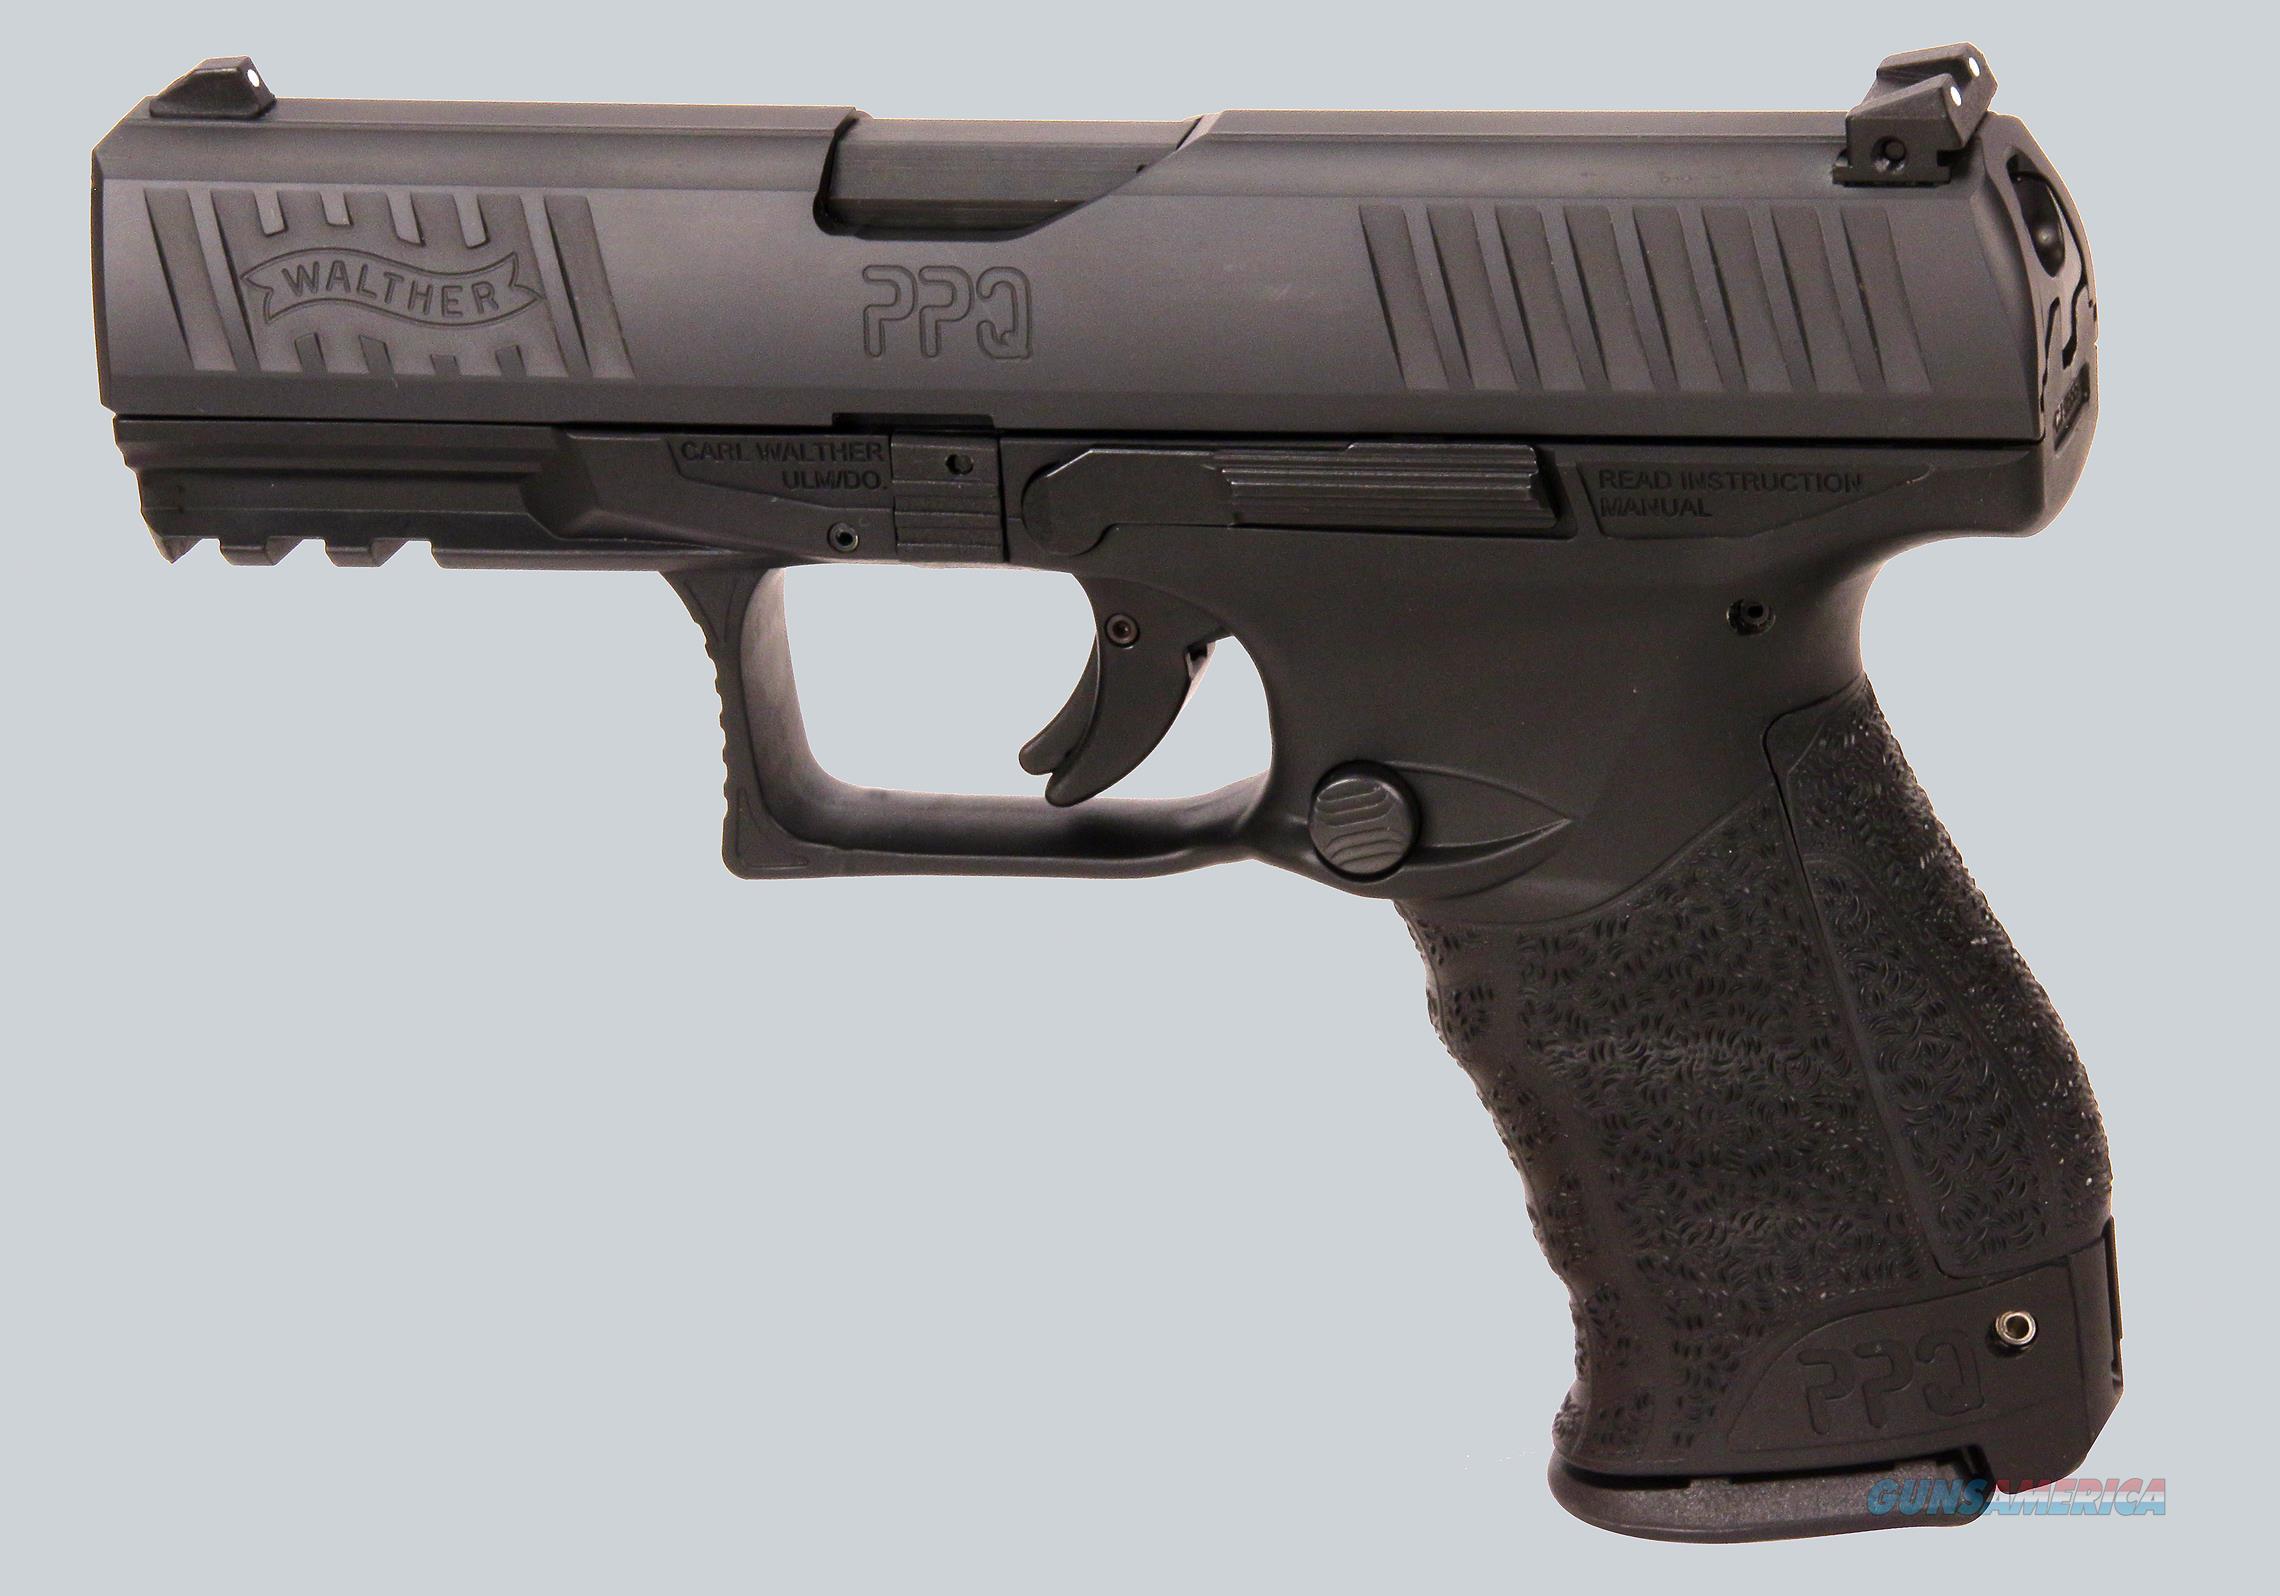 Walther 9mm PPQ M2 Pistol  Guns > Pistols > Walther Pistols > Post WWII > P99/PPQ